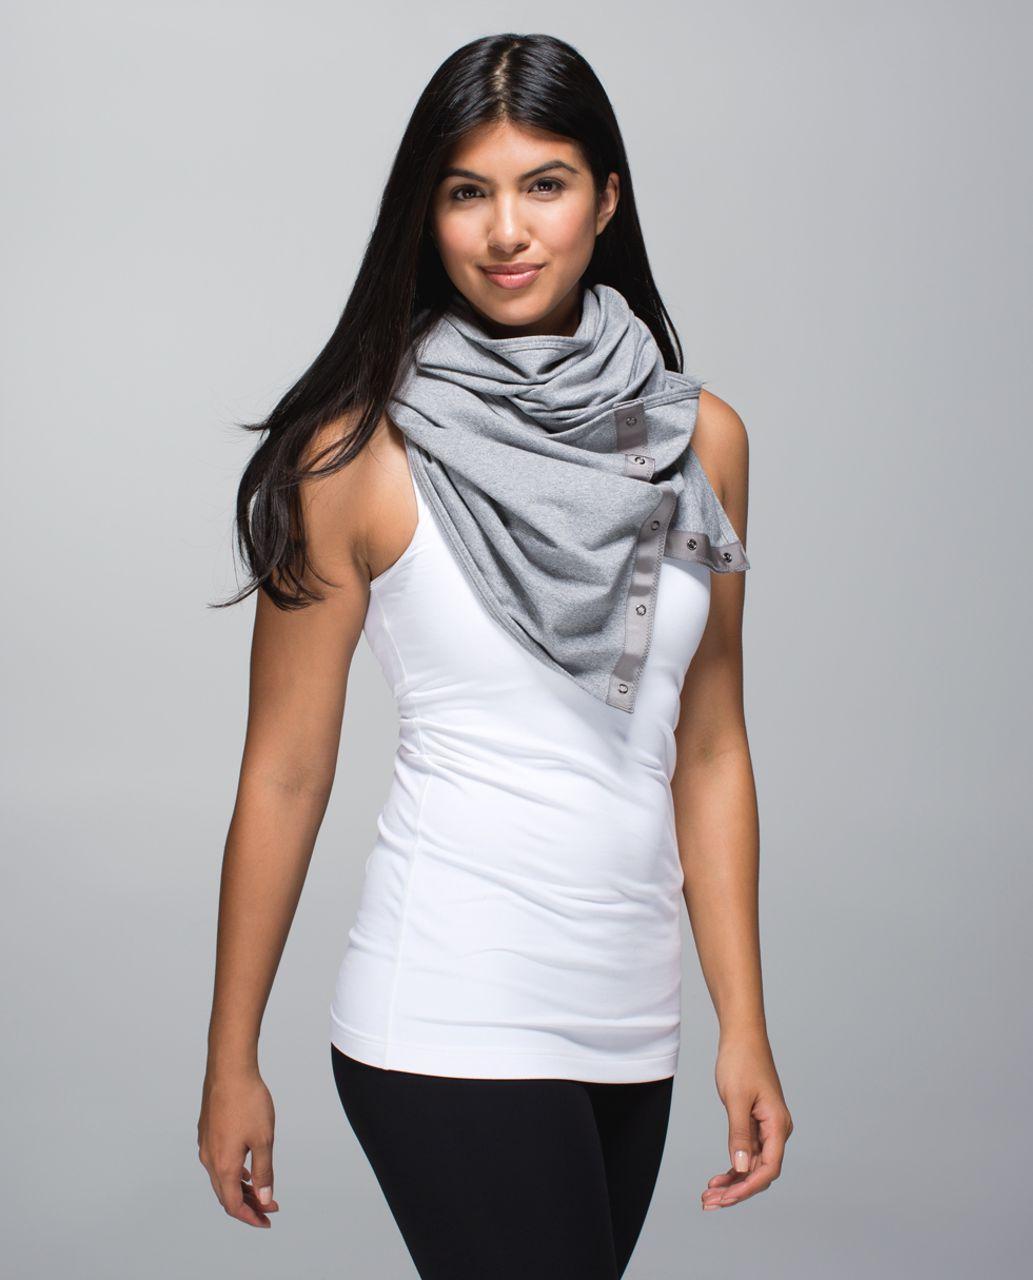 Lululemon Vinyasa Scarf *French Terry - Heathered Speckled Medium Grey